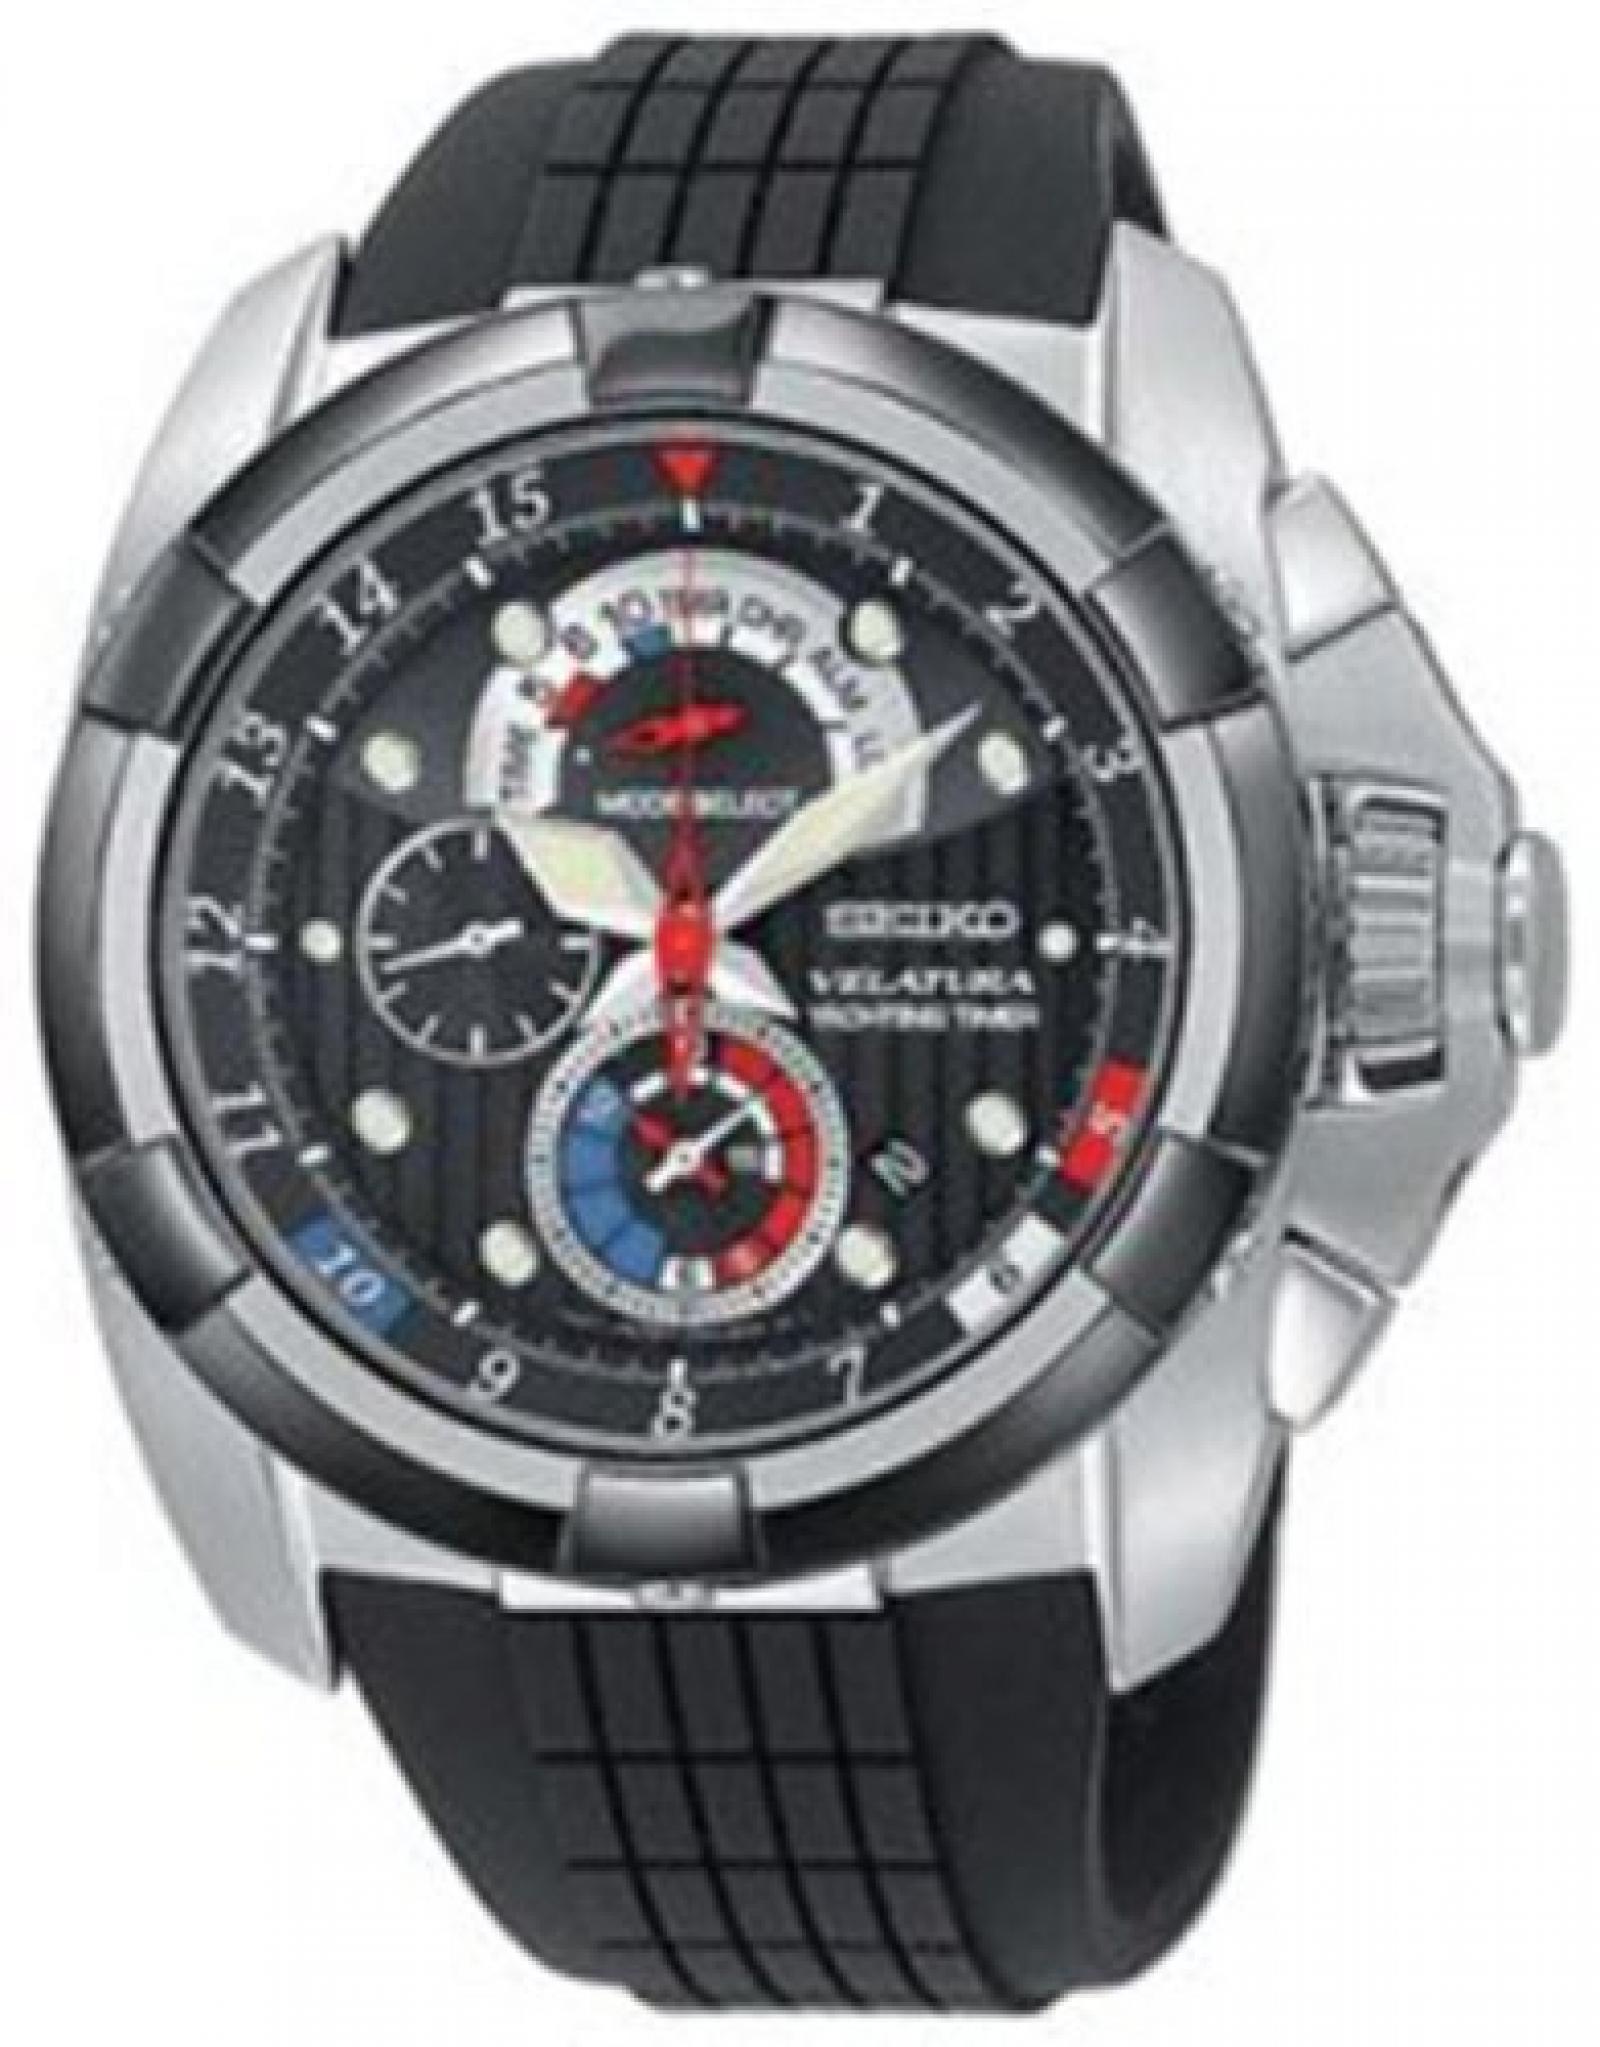 Seiko Damen-Armbanduhr Analog Gummi Schwarz SPC007